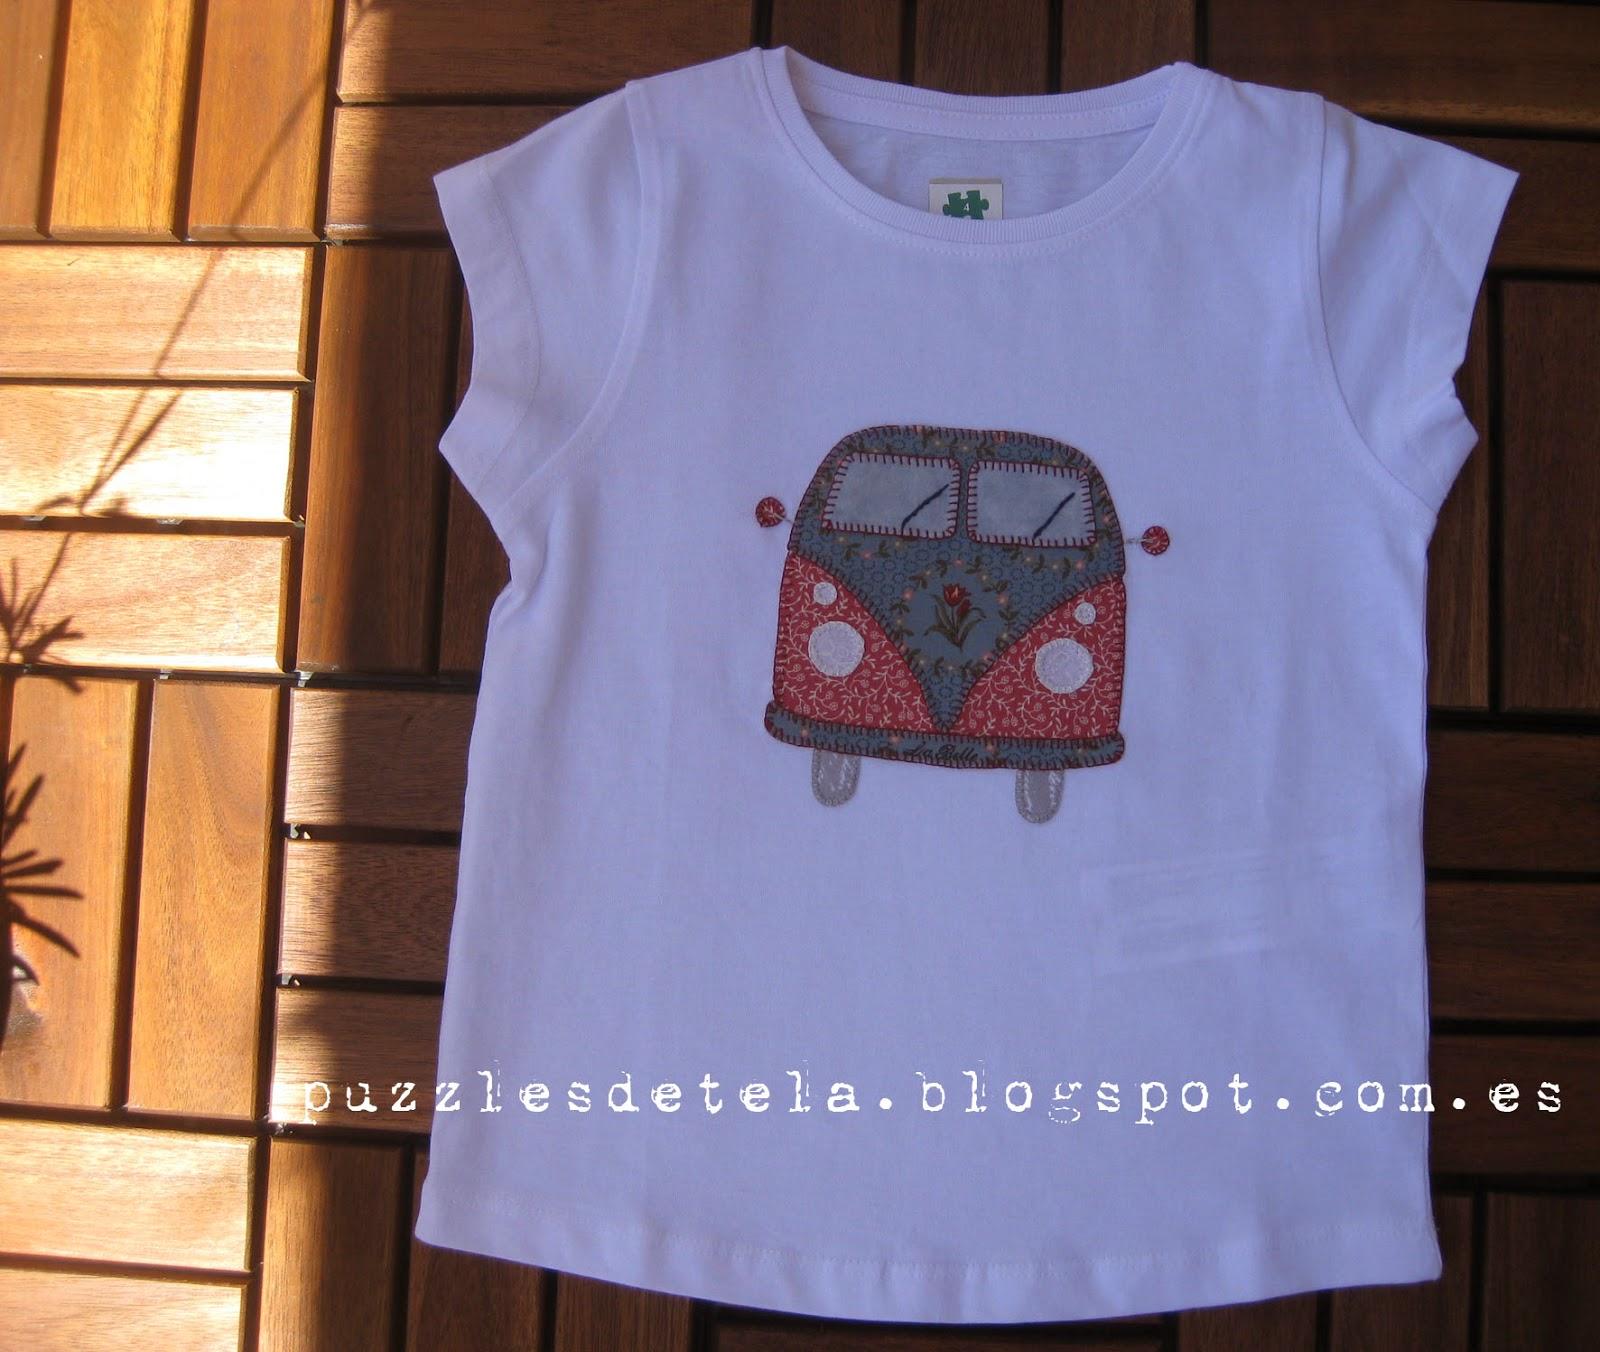 Camiseta Vintage patchwork, Vintage, camiseta patchwork, furgoneta vintage, camiseta furgoneta patchwork, aplicación furgoneta, camiseta con aplicación, Puzzles de tela, Camiseta furgoneta, Camiseta furgoneta volkswagen, Furgoneta Volkswagen